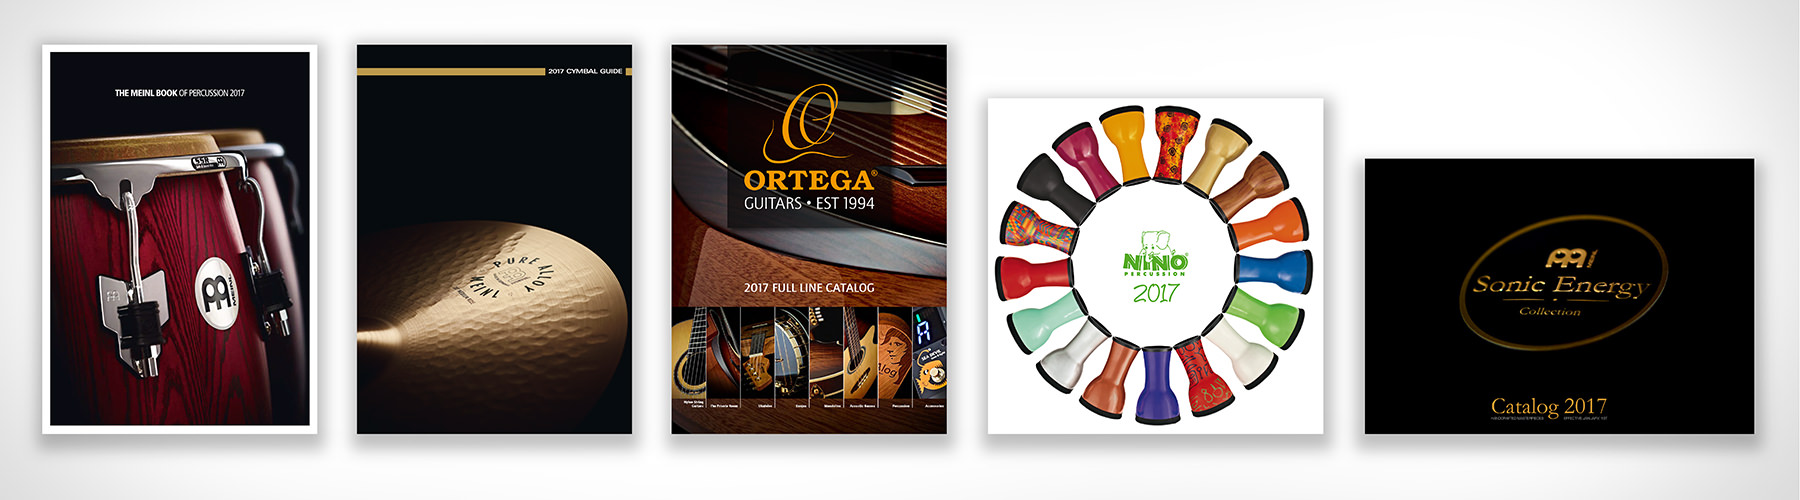 Produktfotografie Meinl Musikinstrumente - Katalogproduktion 2017